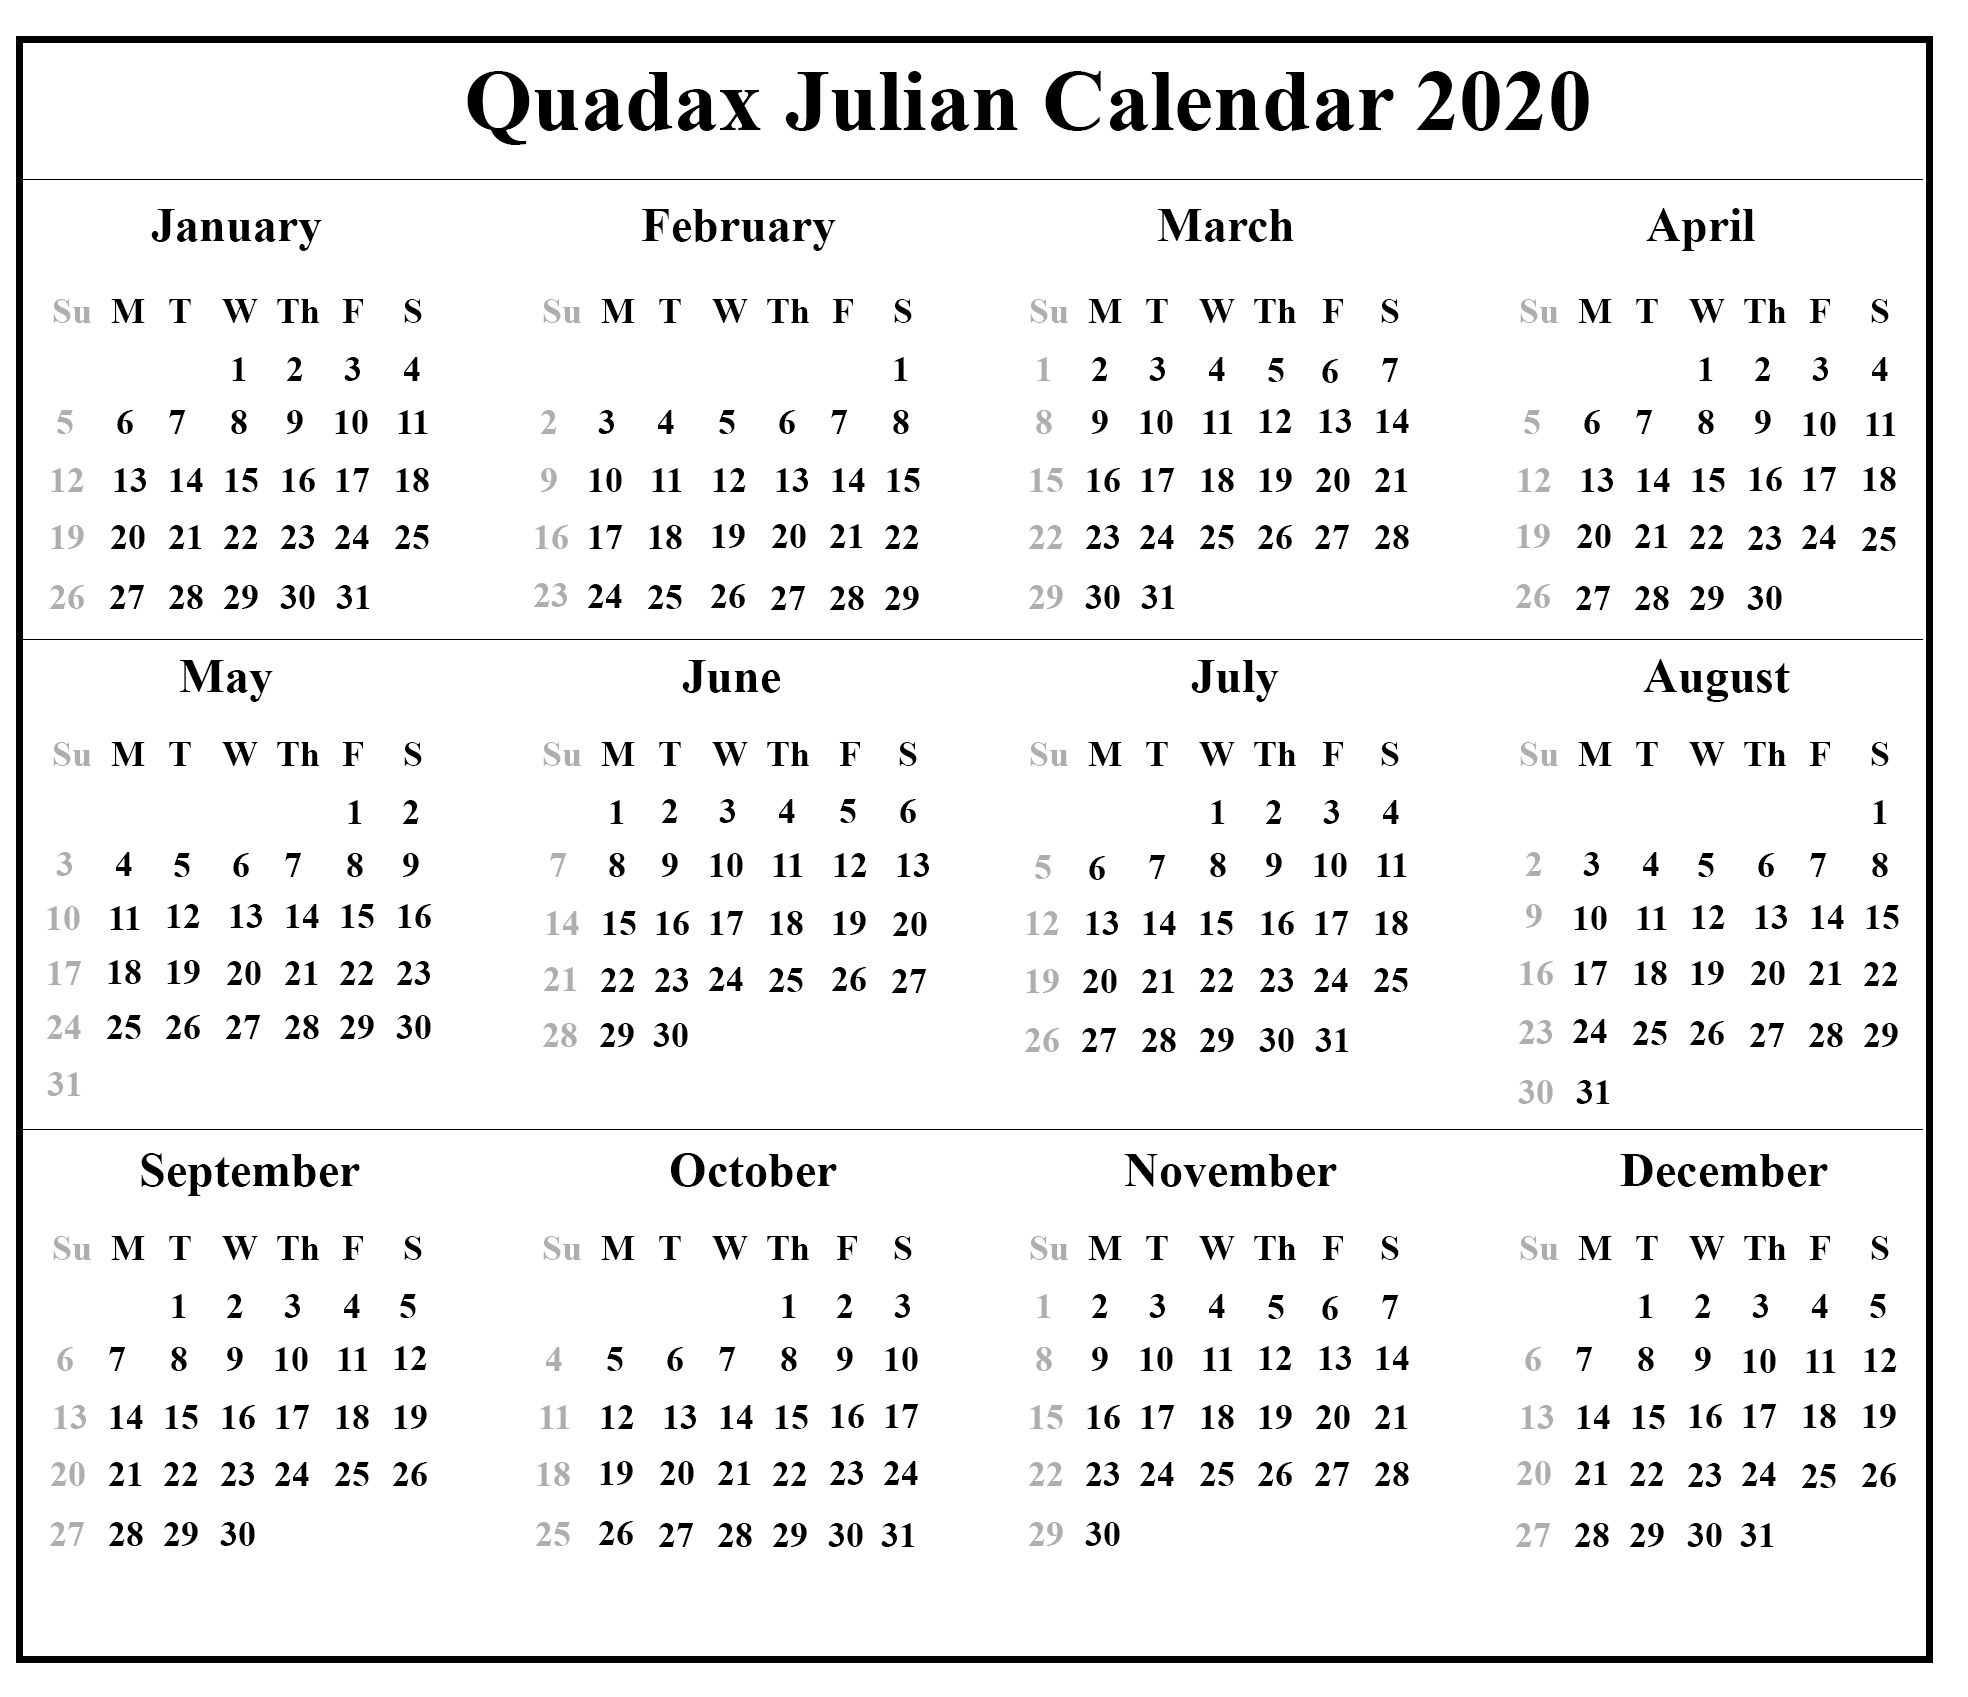 Year Calendar 2020 Special Days In 2020 | Calendar Template for Yearly Calendar Of Special Days